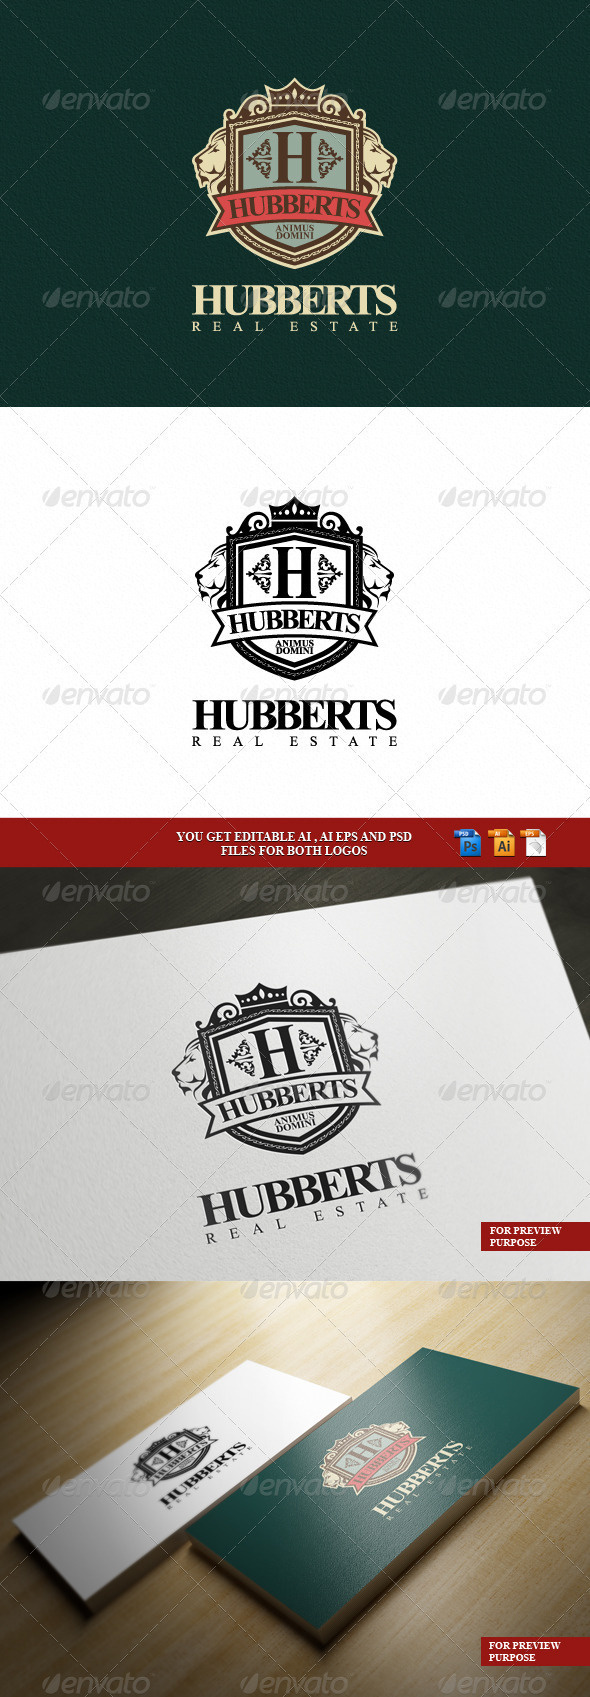 Hubberts Royal Crest Logo Crests Logo Templates #crest